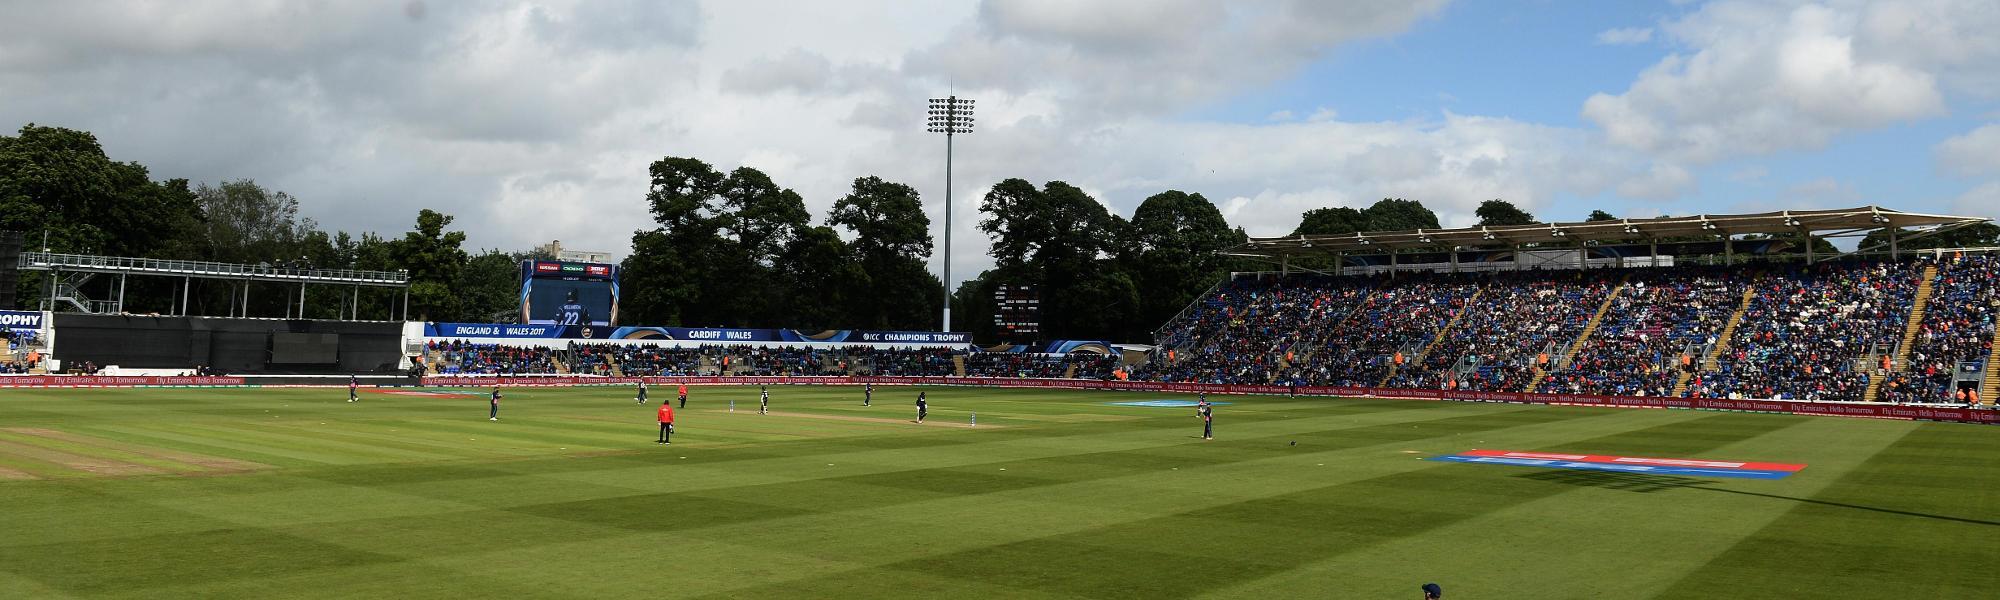 Cardiff Wales Stadium.jpg